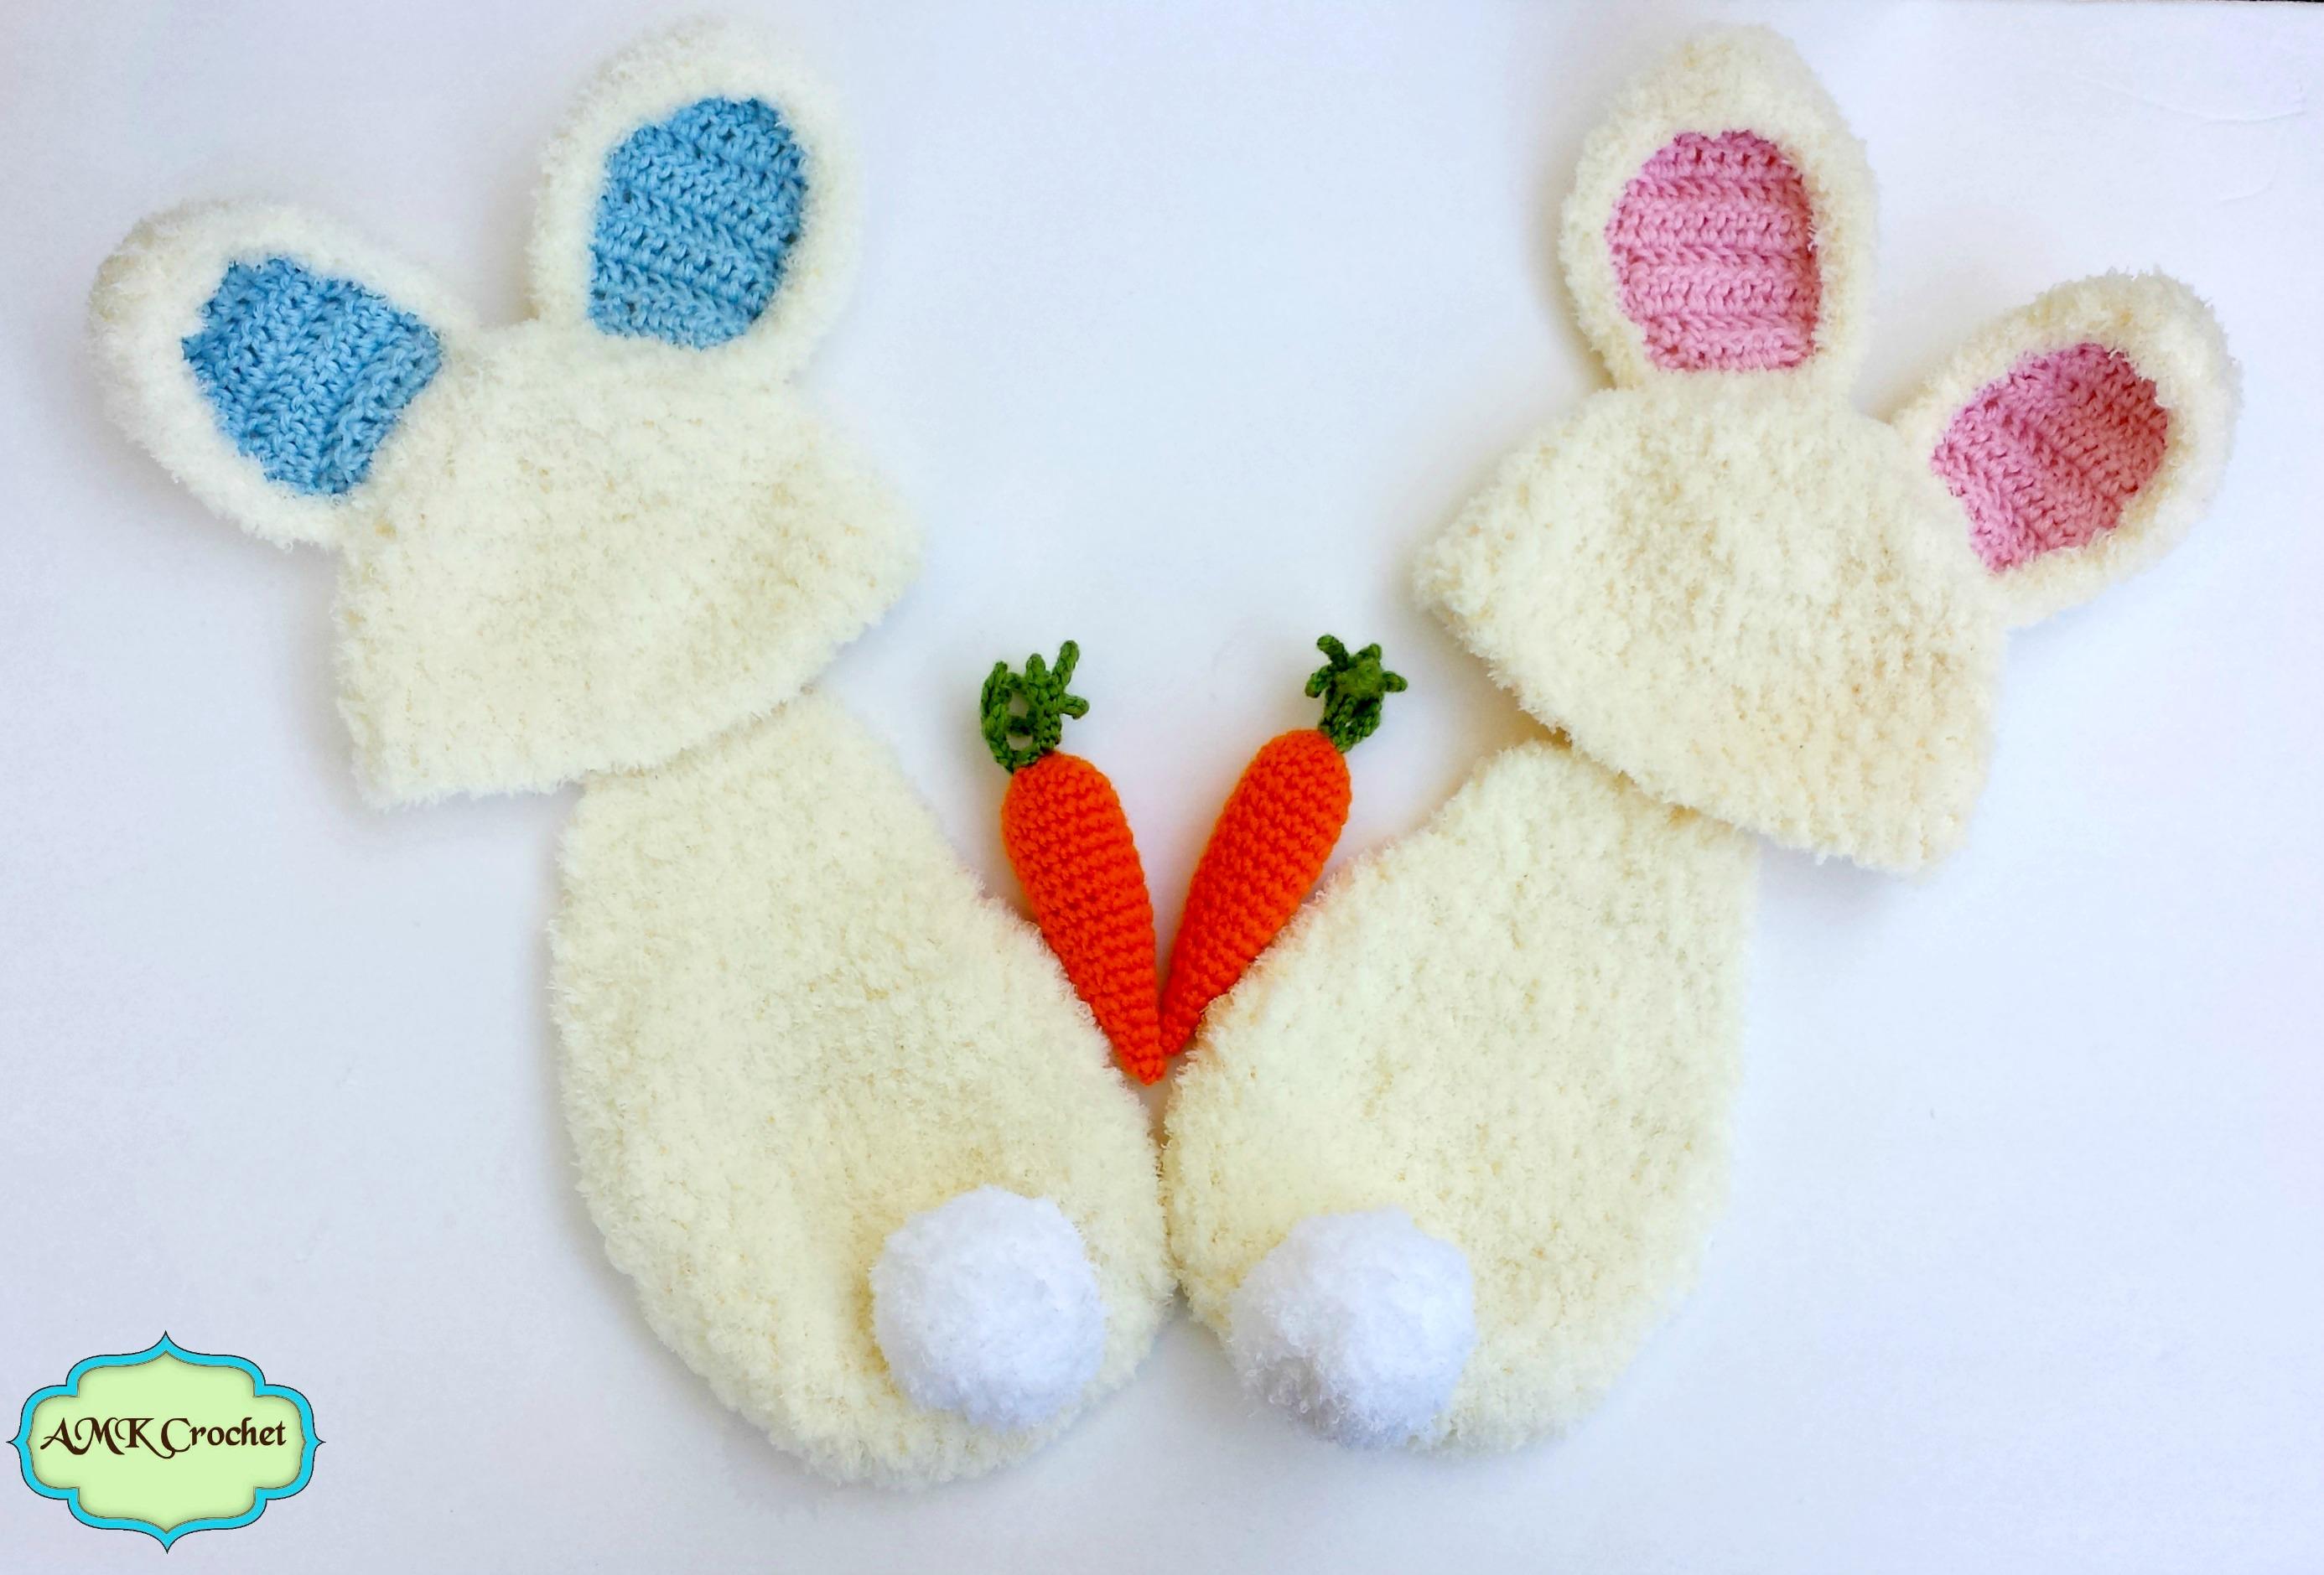 Crochet Newborn Fuzzy Bunny Hat and Cape Set with Amigurumi Carrot ...